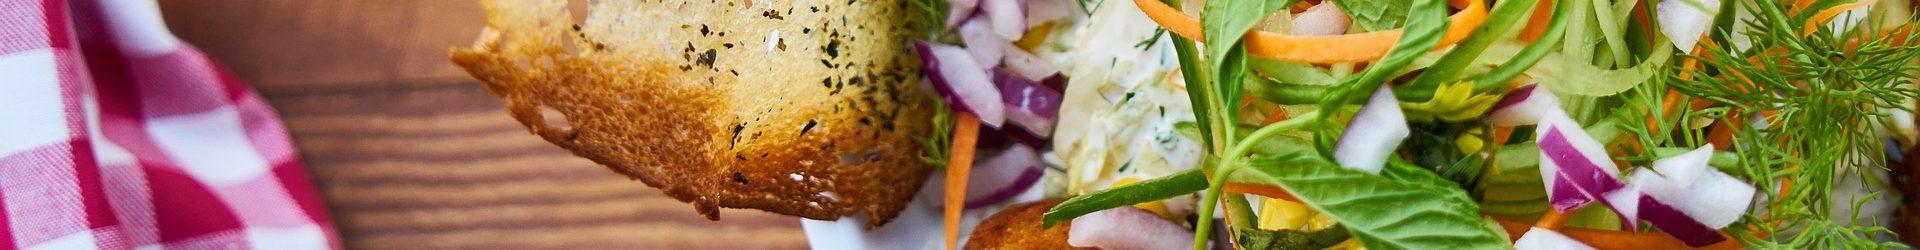 Beneficios e inconvenientes de una dieta vegana